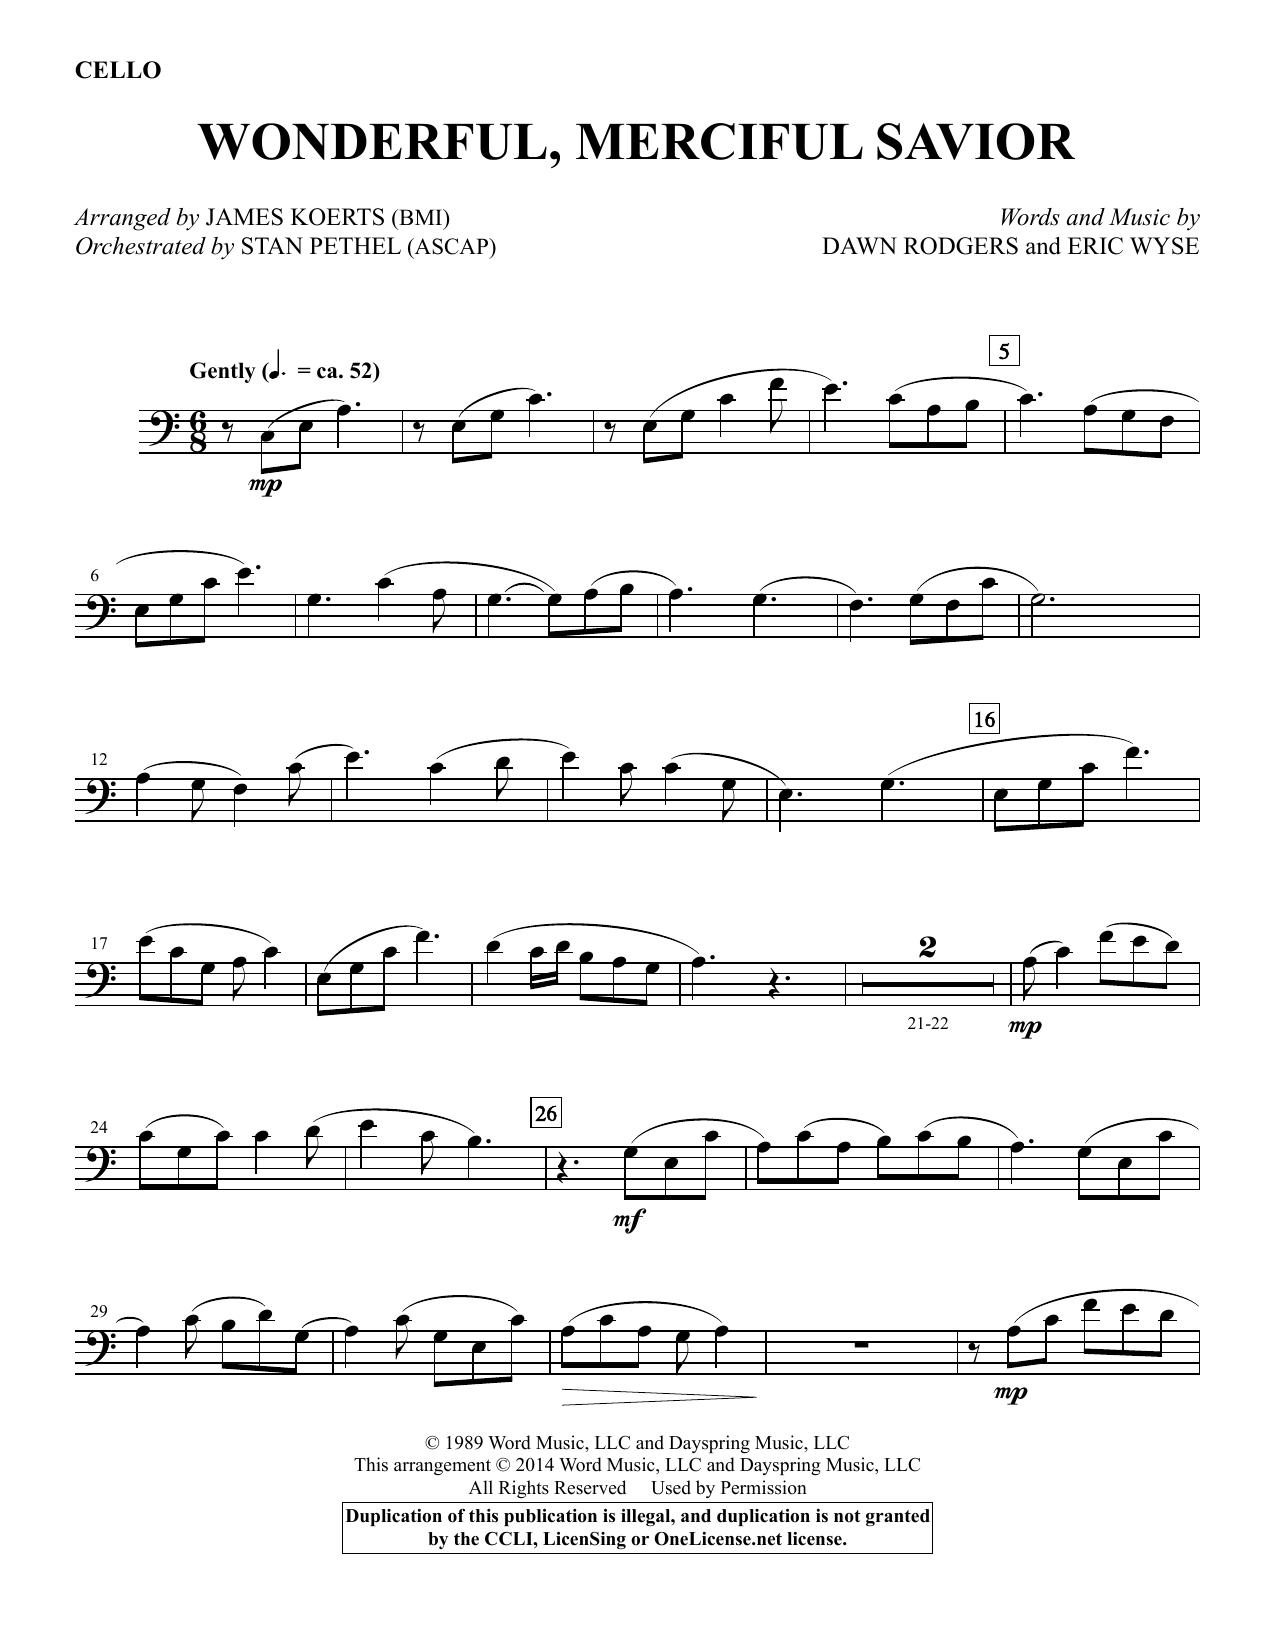 James Koerts Wonderful, Merciful Savior - Cello sheet music notes and chords. Download Printable PDF.